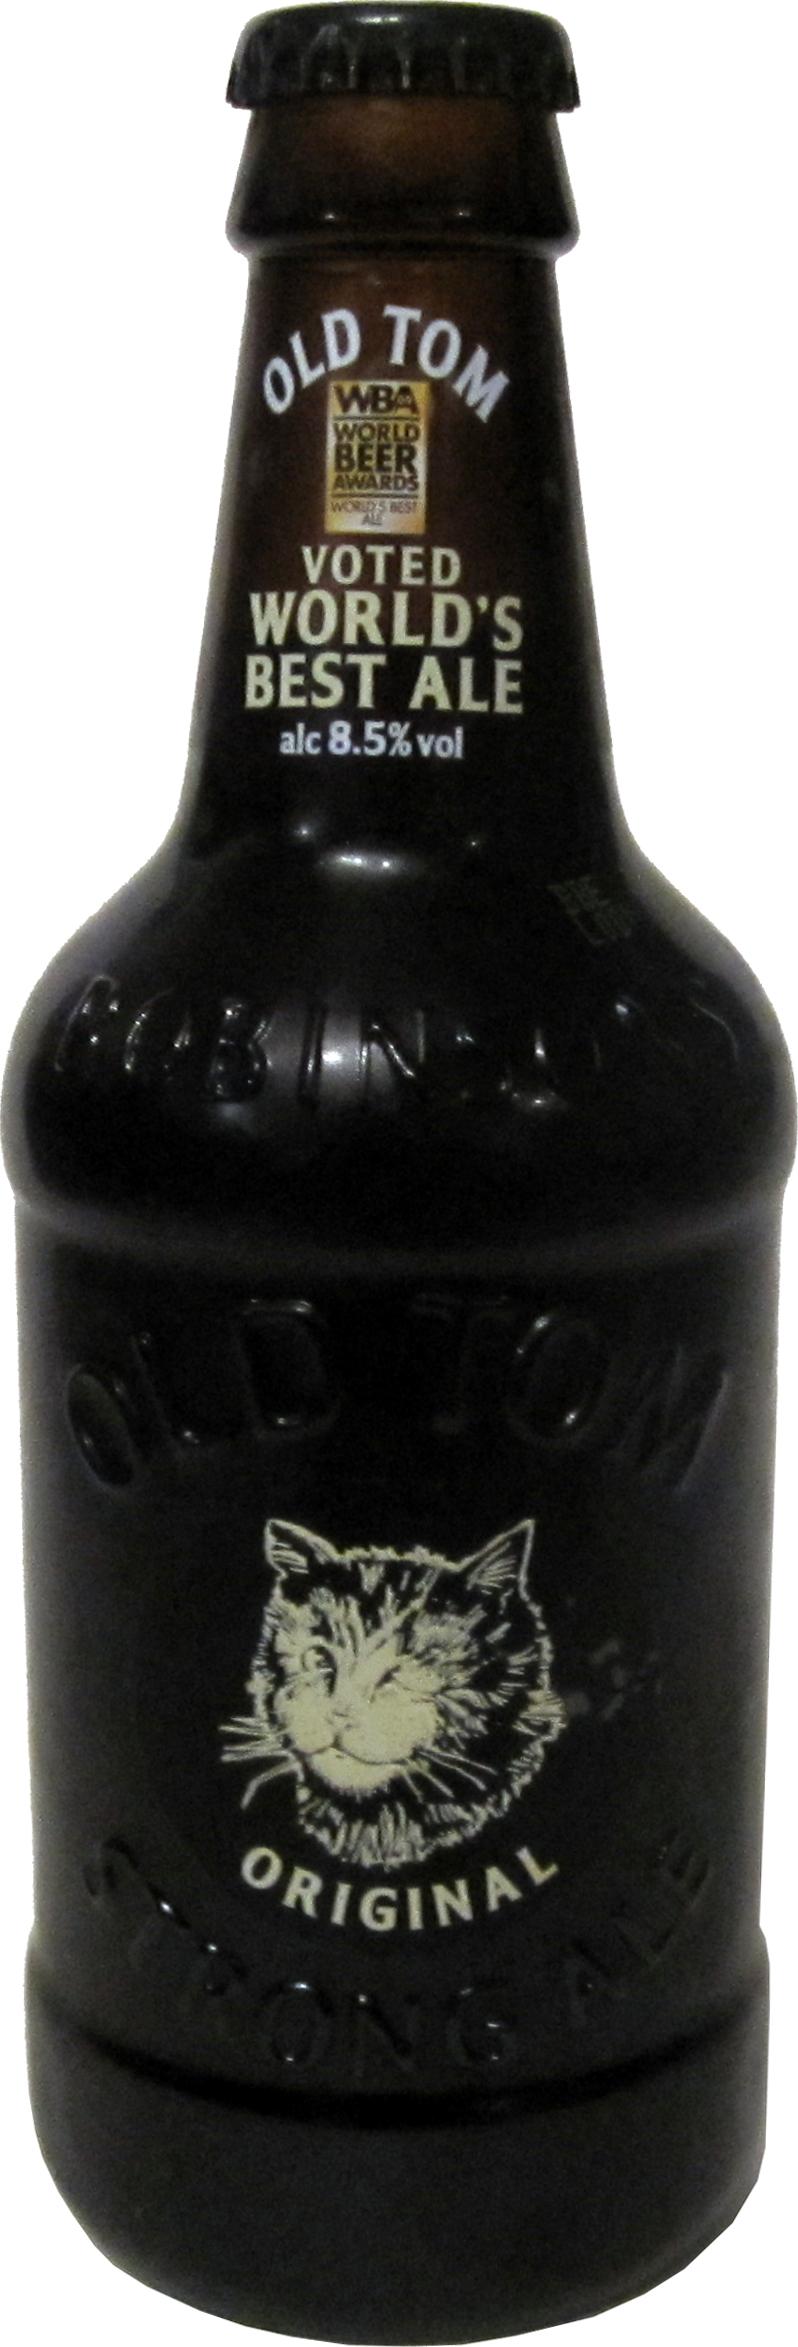 cat beer bottle animal - photo #39